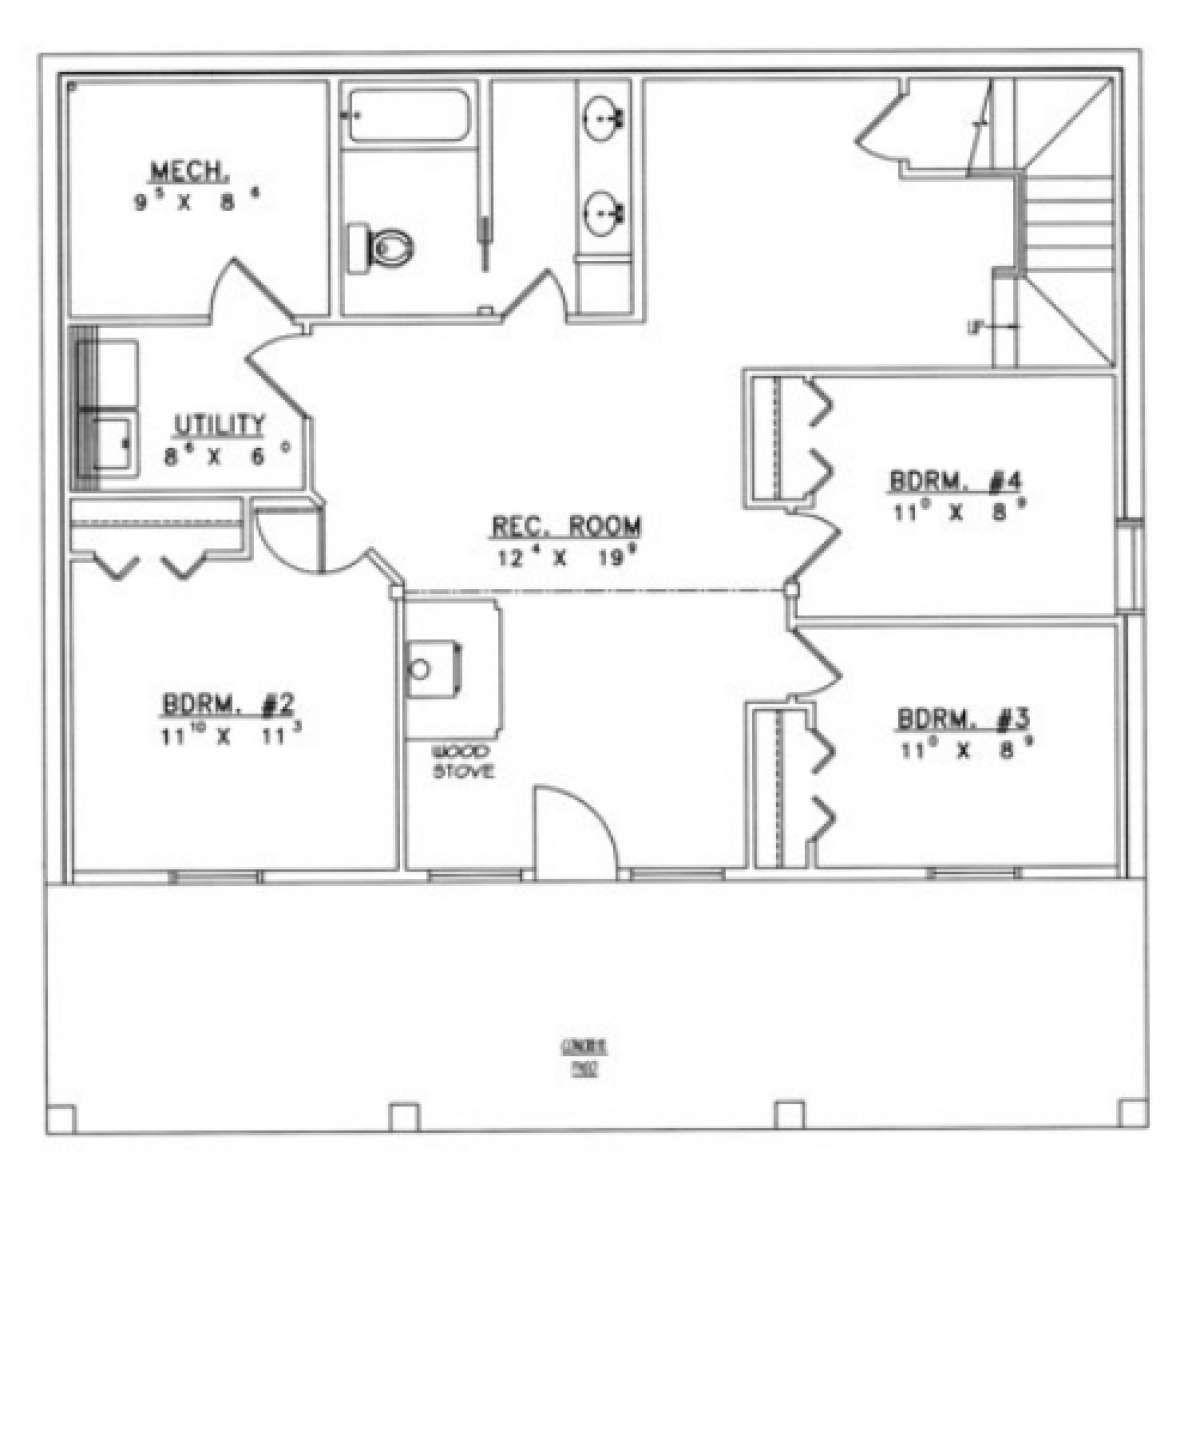 House Plan 039 00278 Narrow Lot Plan 2 338 Square Feet 4 Bedrooms 2 5 Bathrooms In 2020 House Plans Basement House Plans Best House Plans